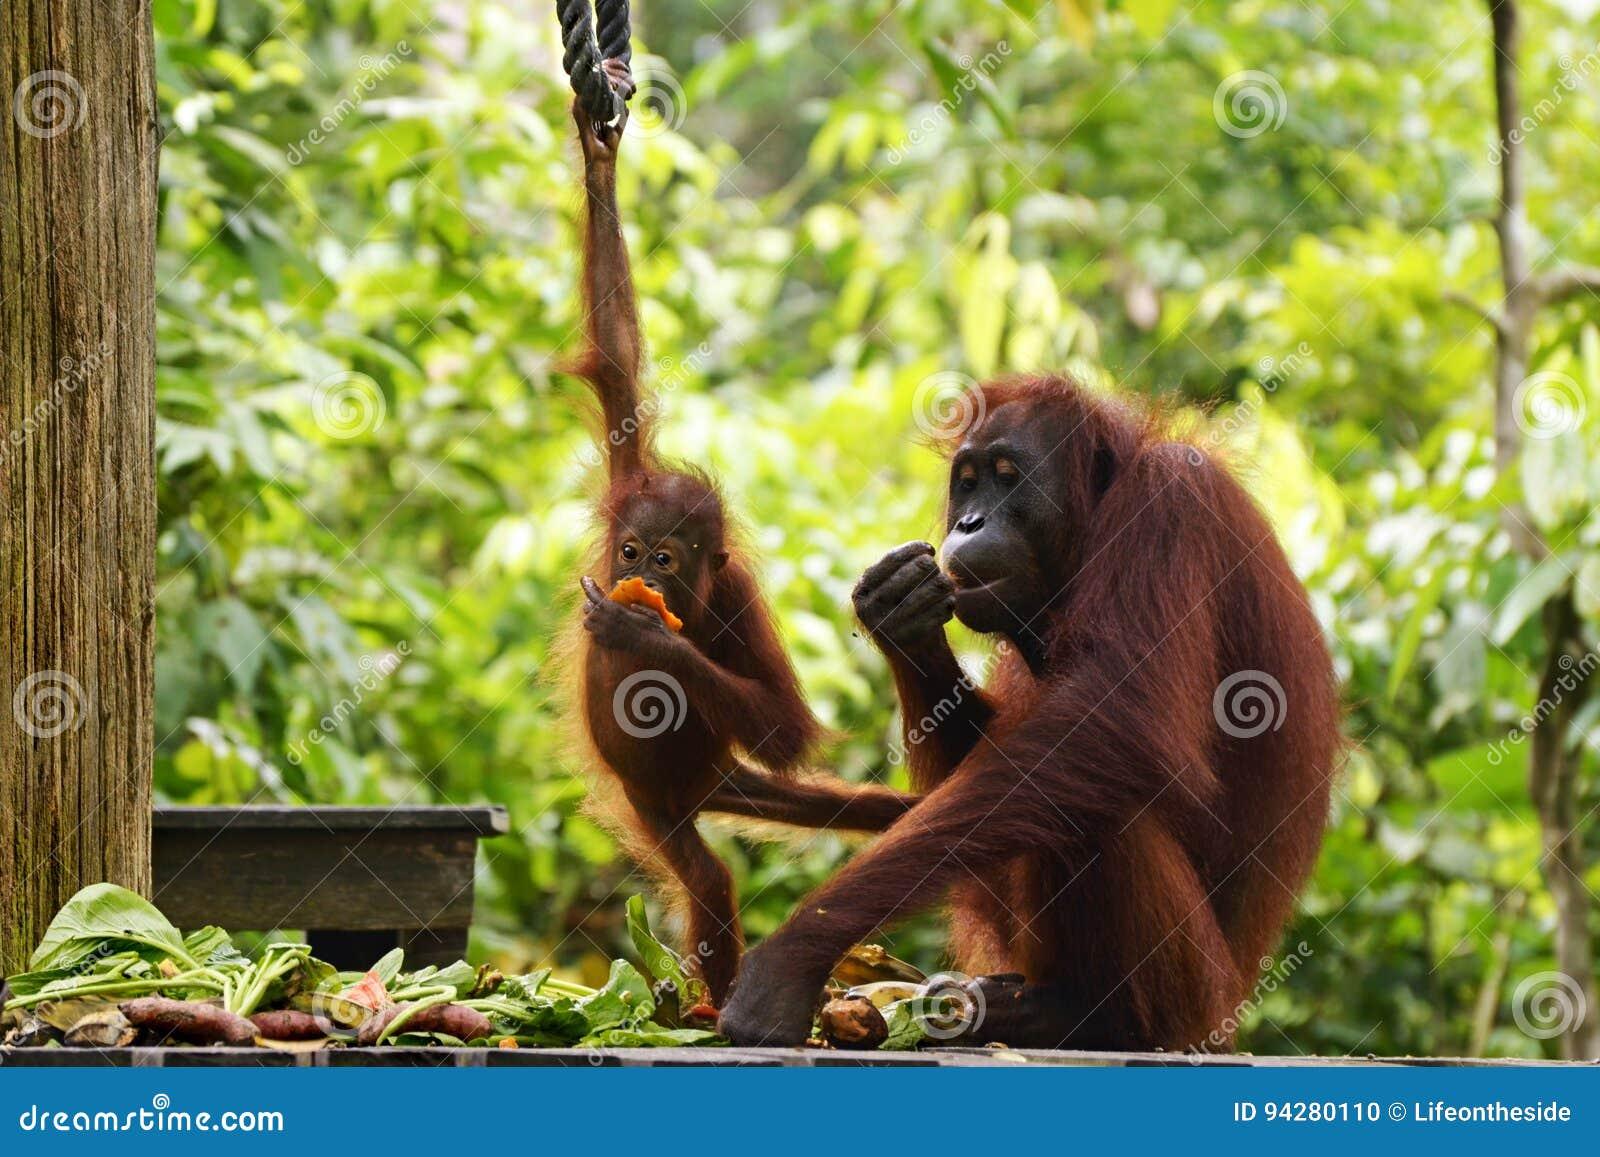 Mother and baby orangutans rehabilitation Borneo, Malaysia